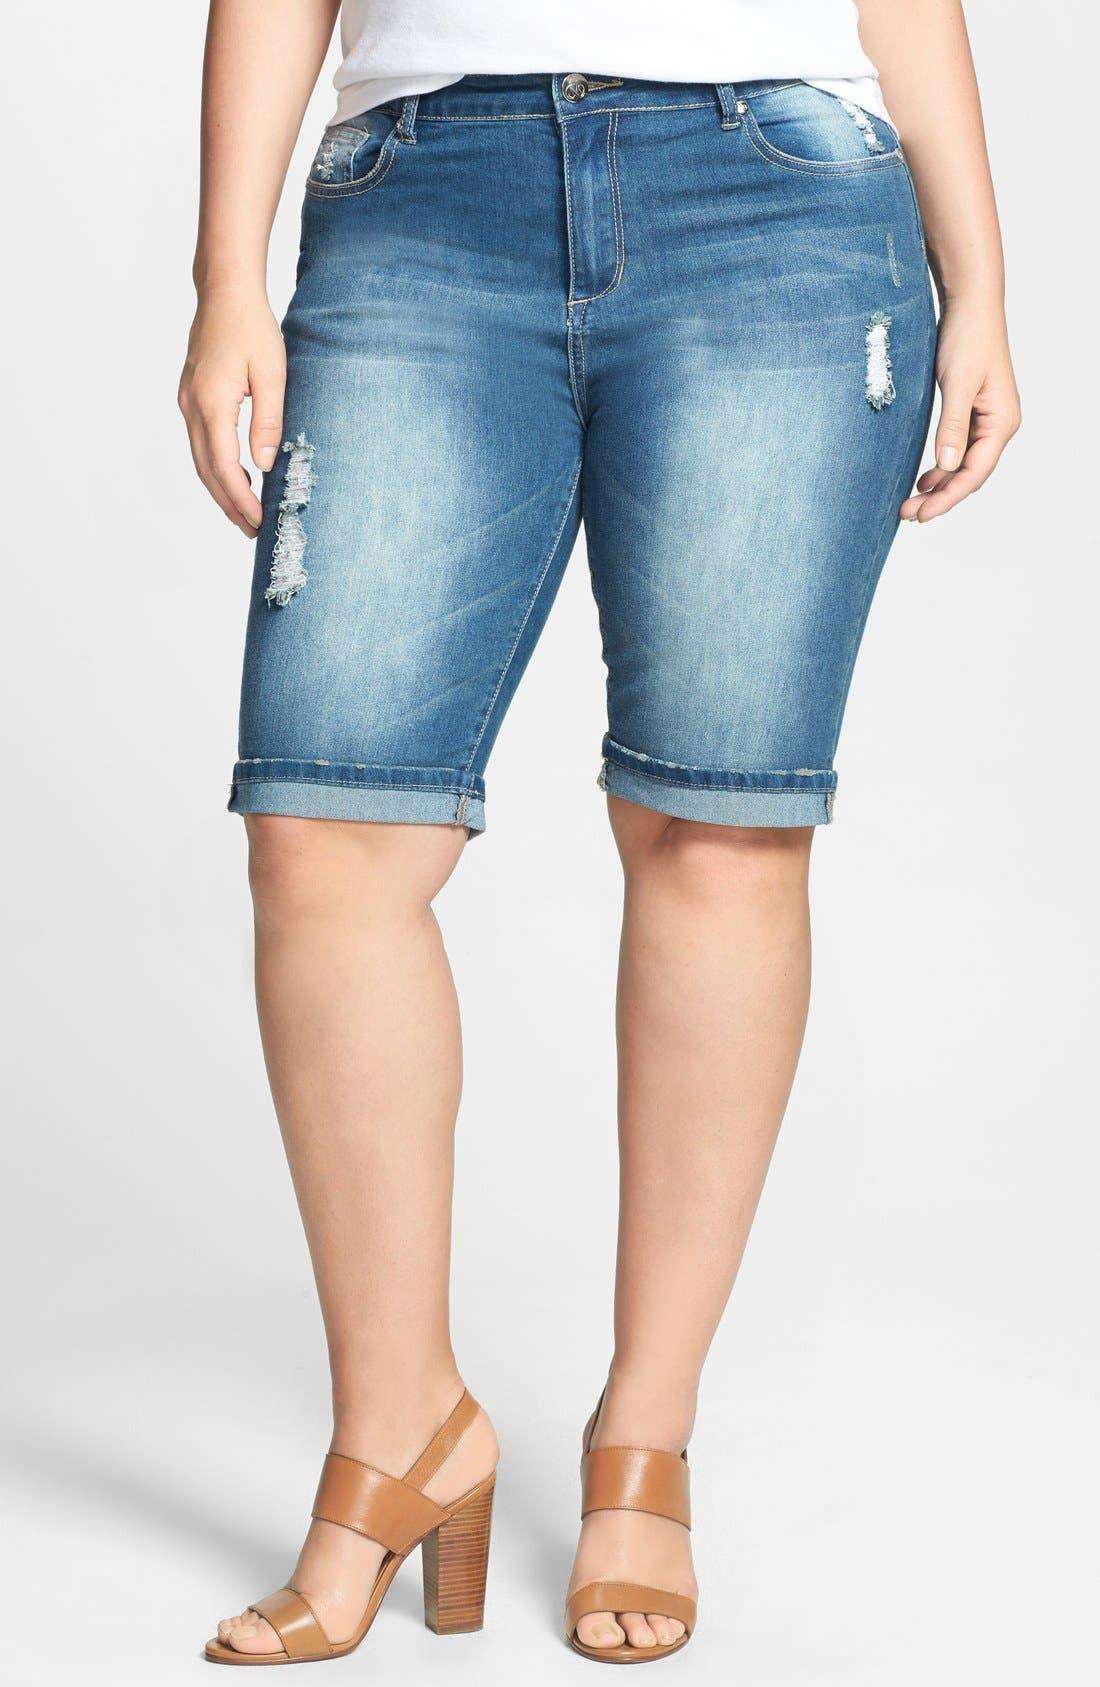 Main Image - City Chic Roll Cuff Distressed Denim Bermuda Shorts (Plus Size)